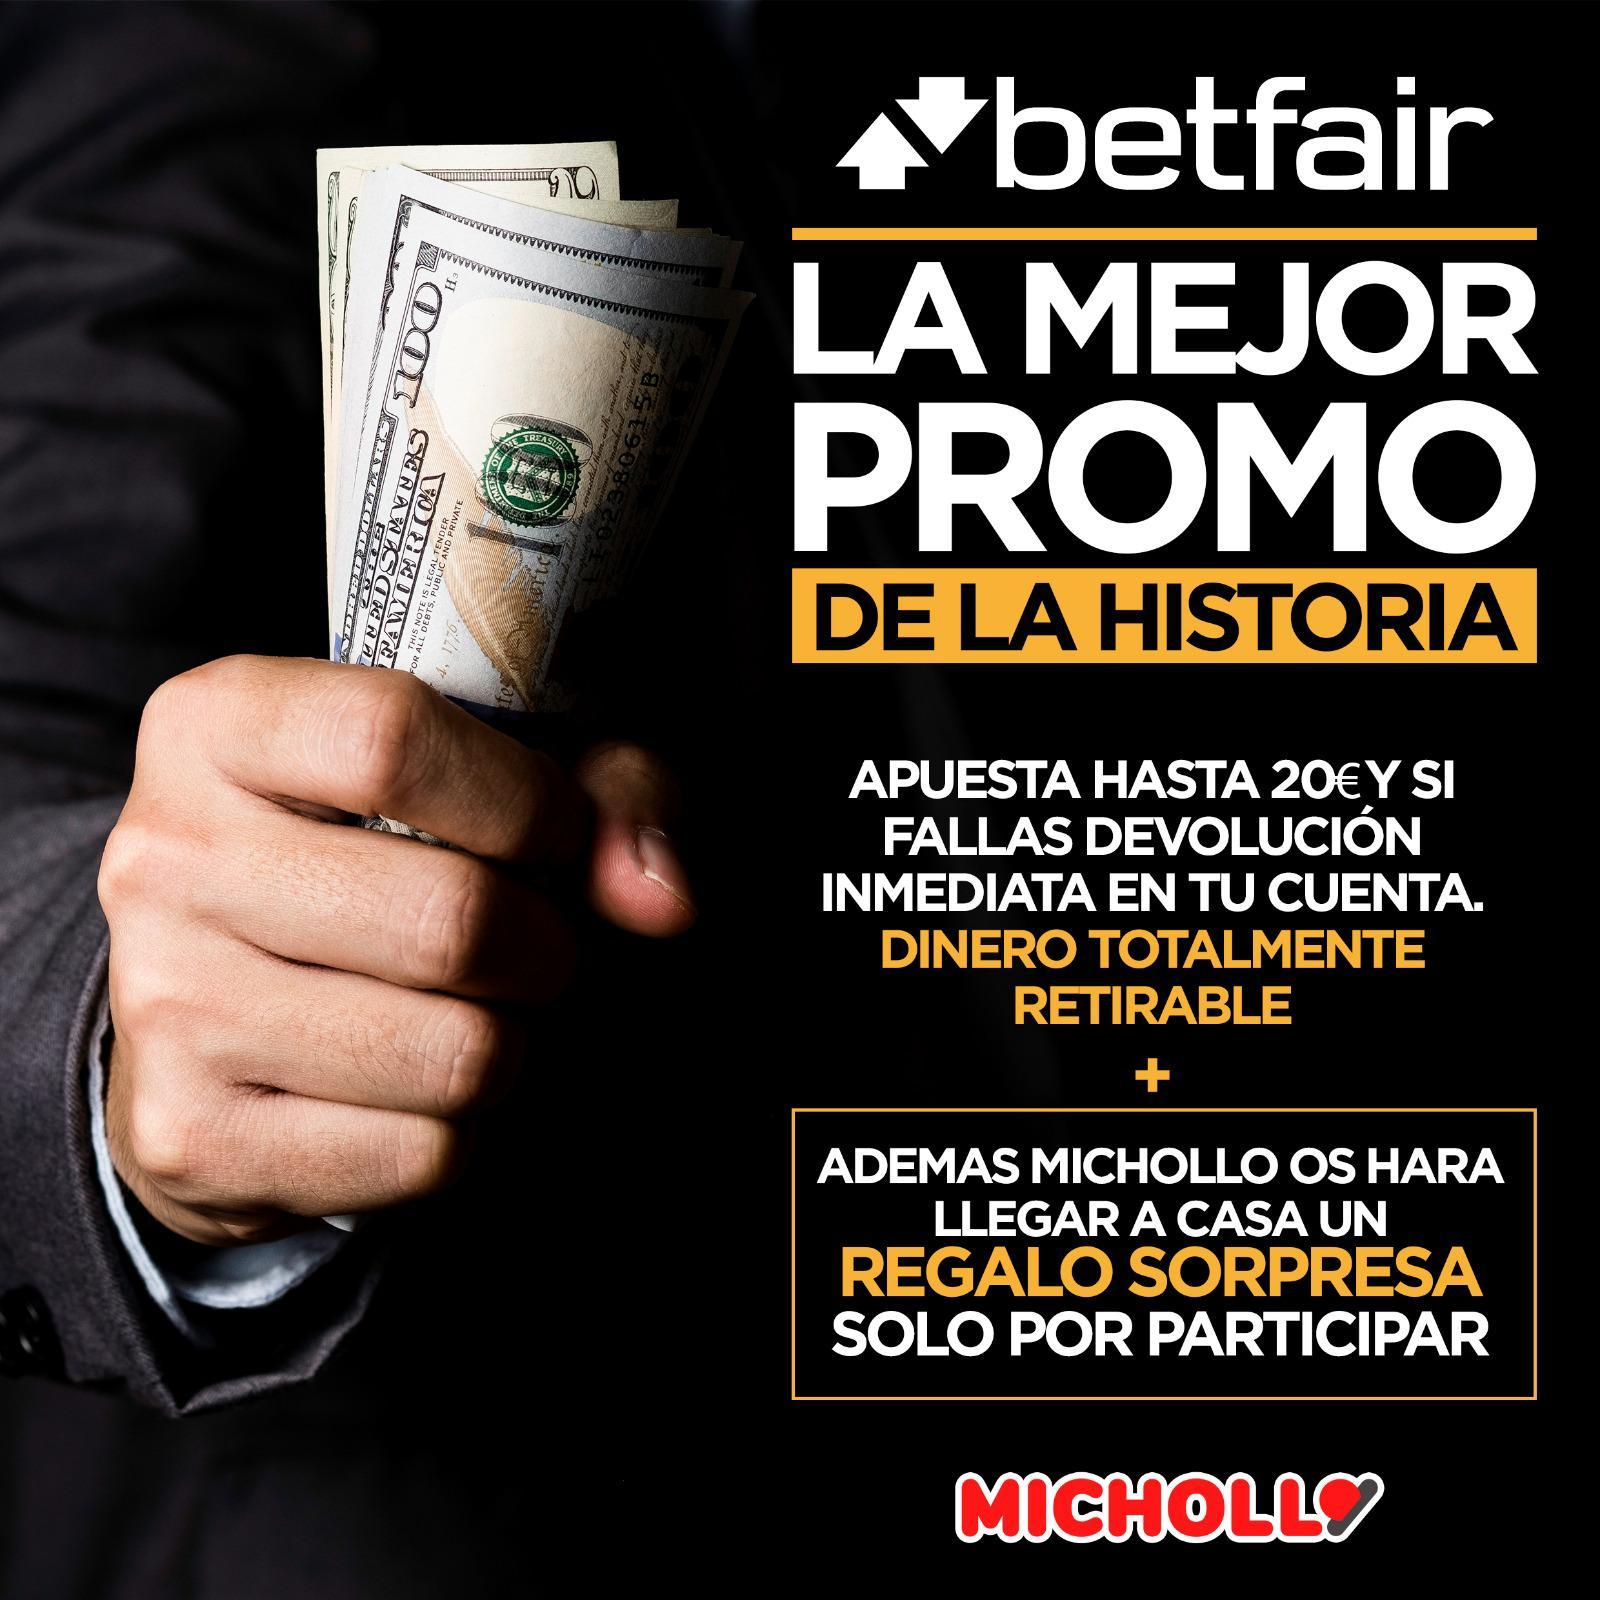 Devolución inmediata de hasta 20€ en caso de fallo con Betfair +Sorpresa